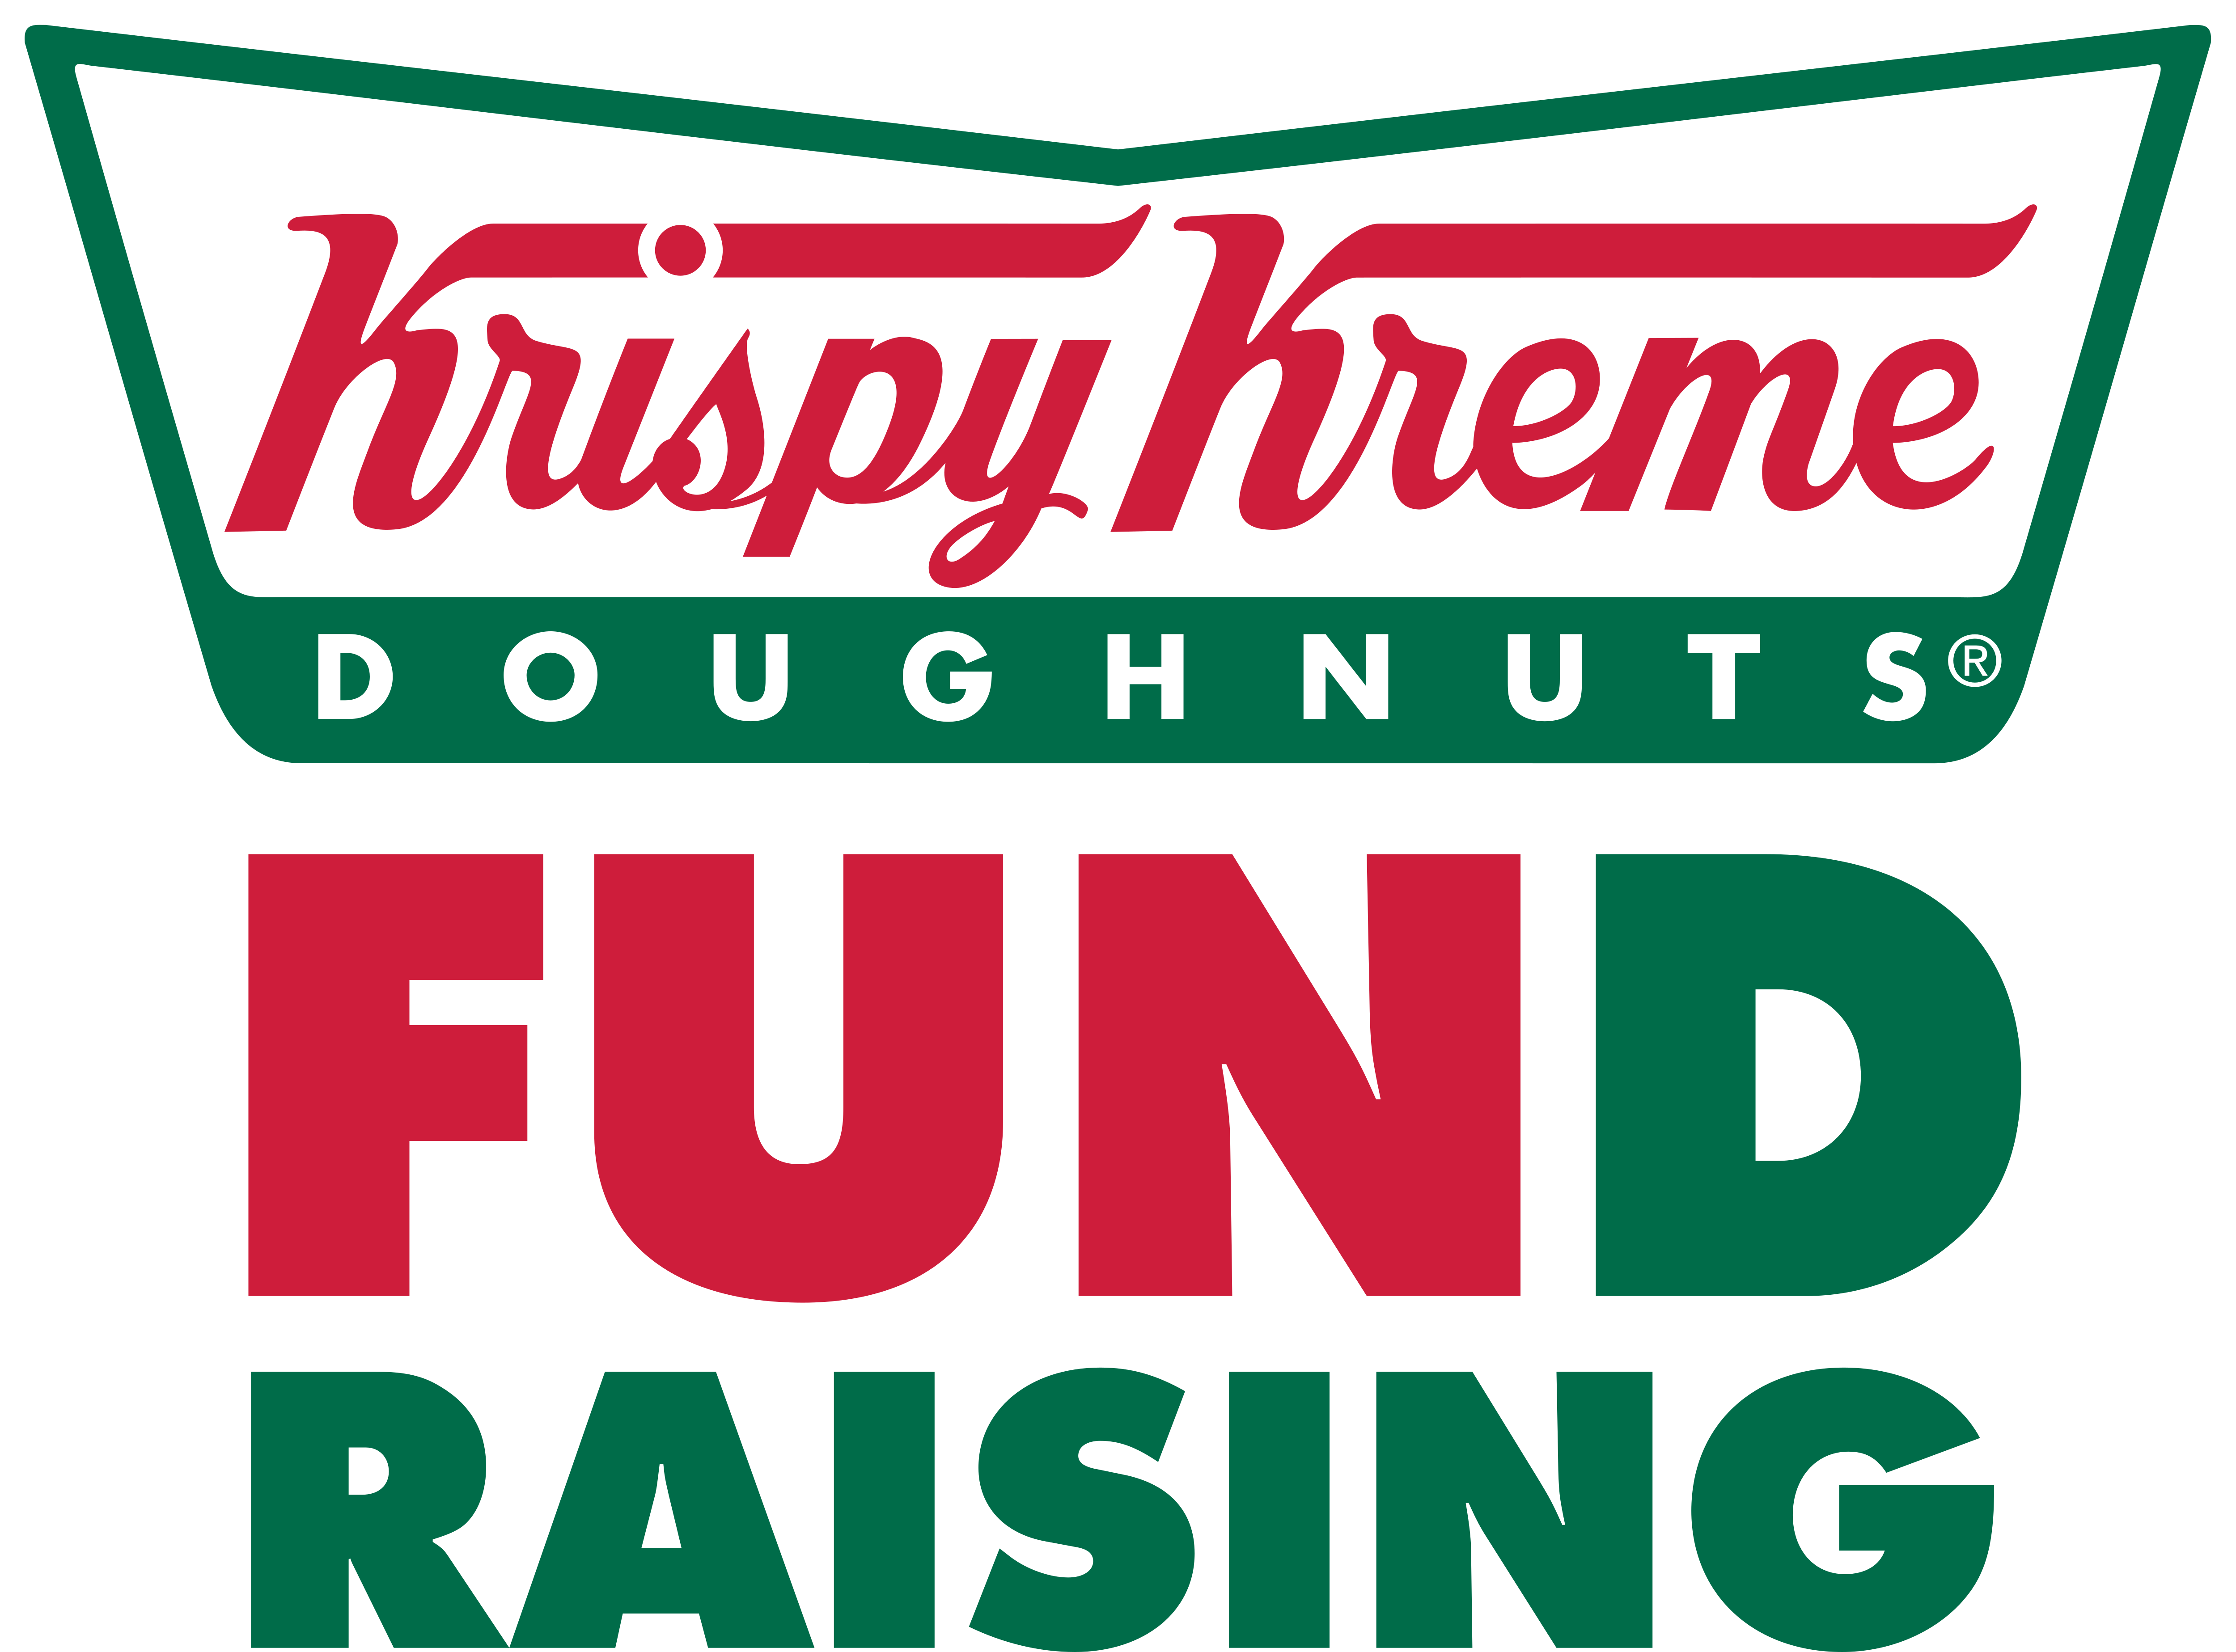 Krispy Kreme Fundraising.